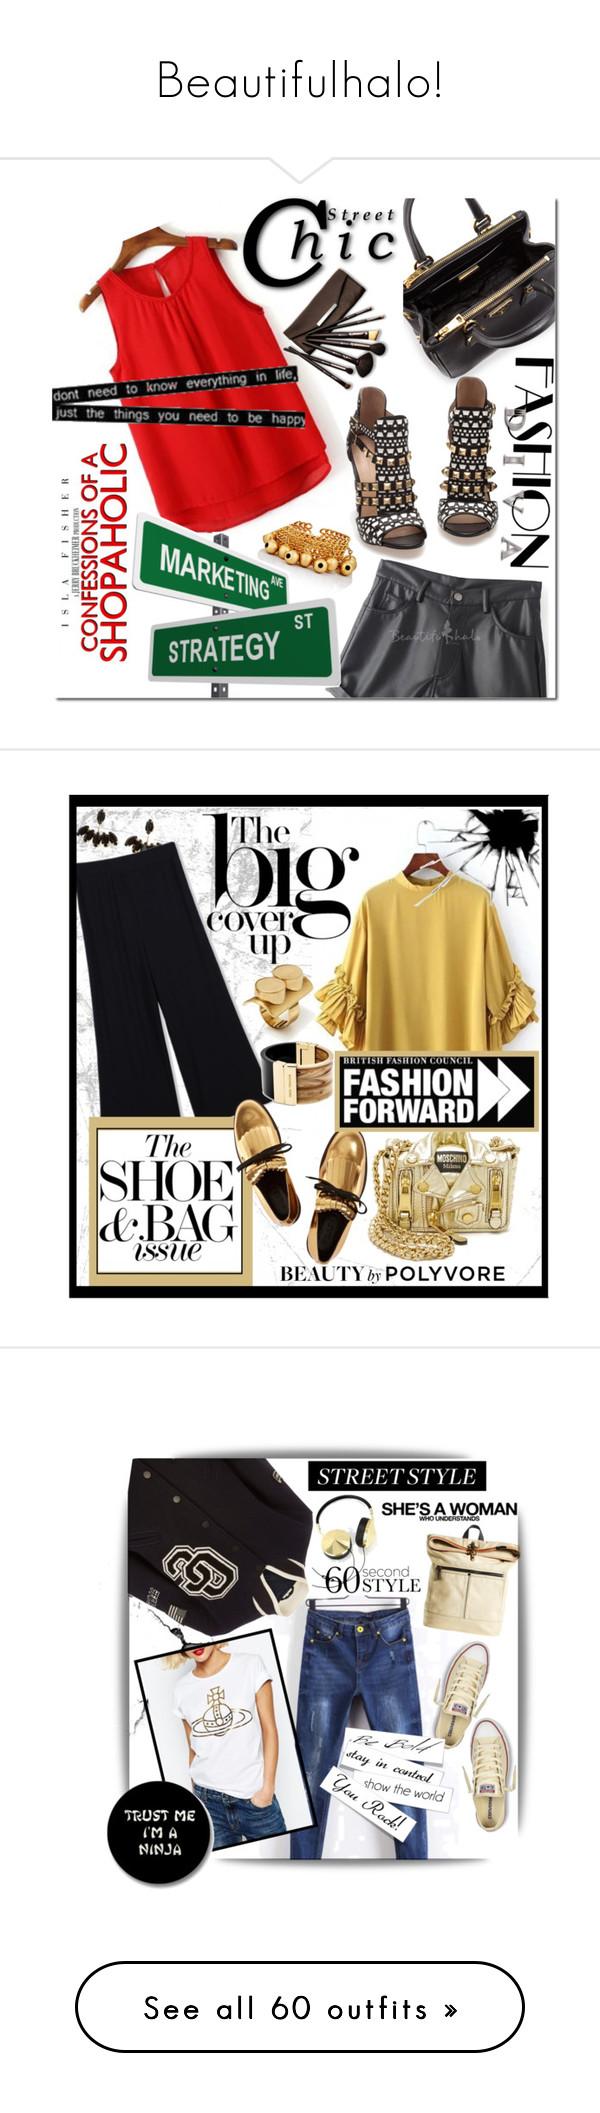 """Beautifulhalo!"" by ina-kis ❤ liked on Polyvore featuring Prada, Zara, Borghese, beautifulhalo, Emma Watson, Tory Burch, Moschino, Michael Kors, Marni and STATE Bags"